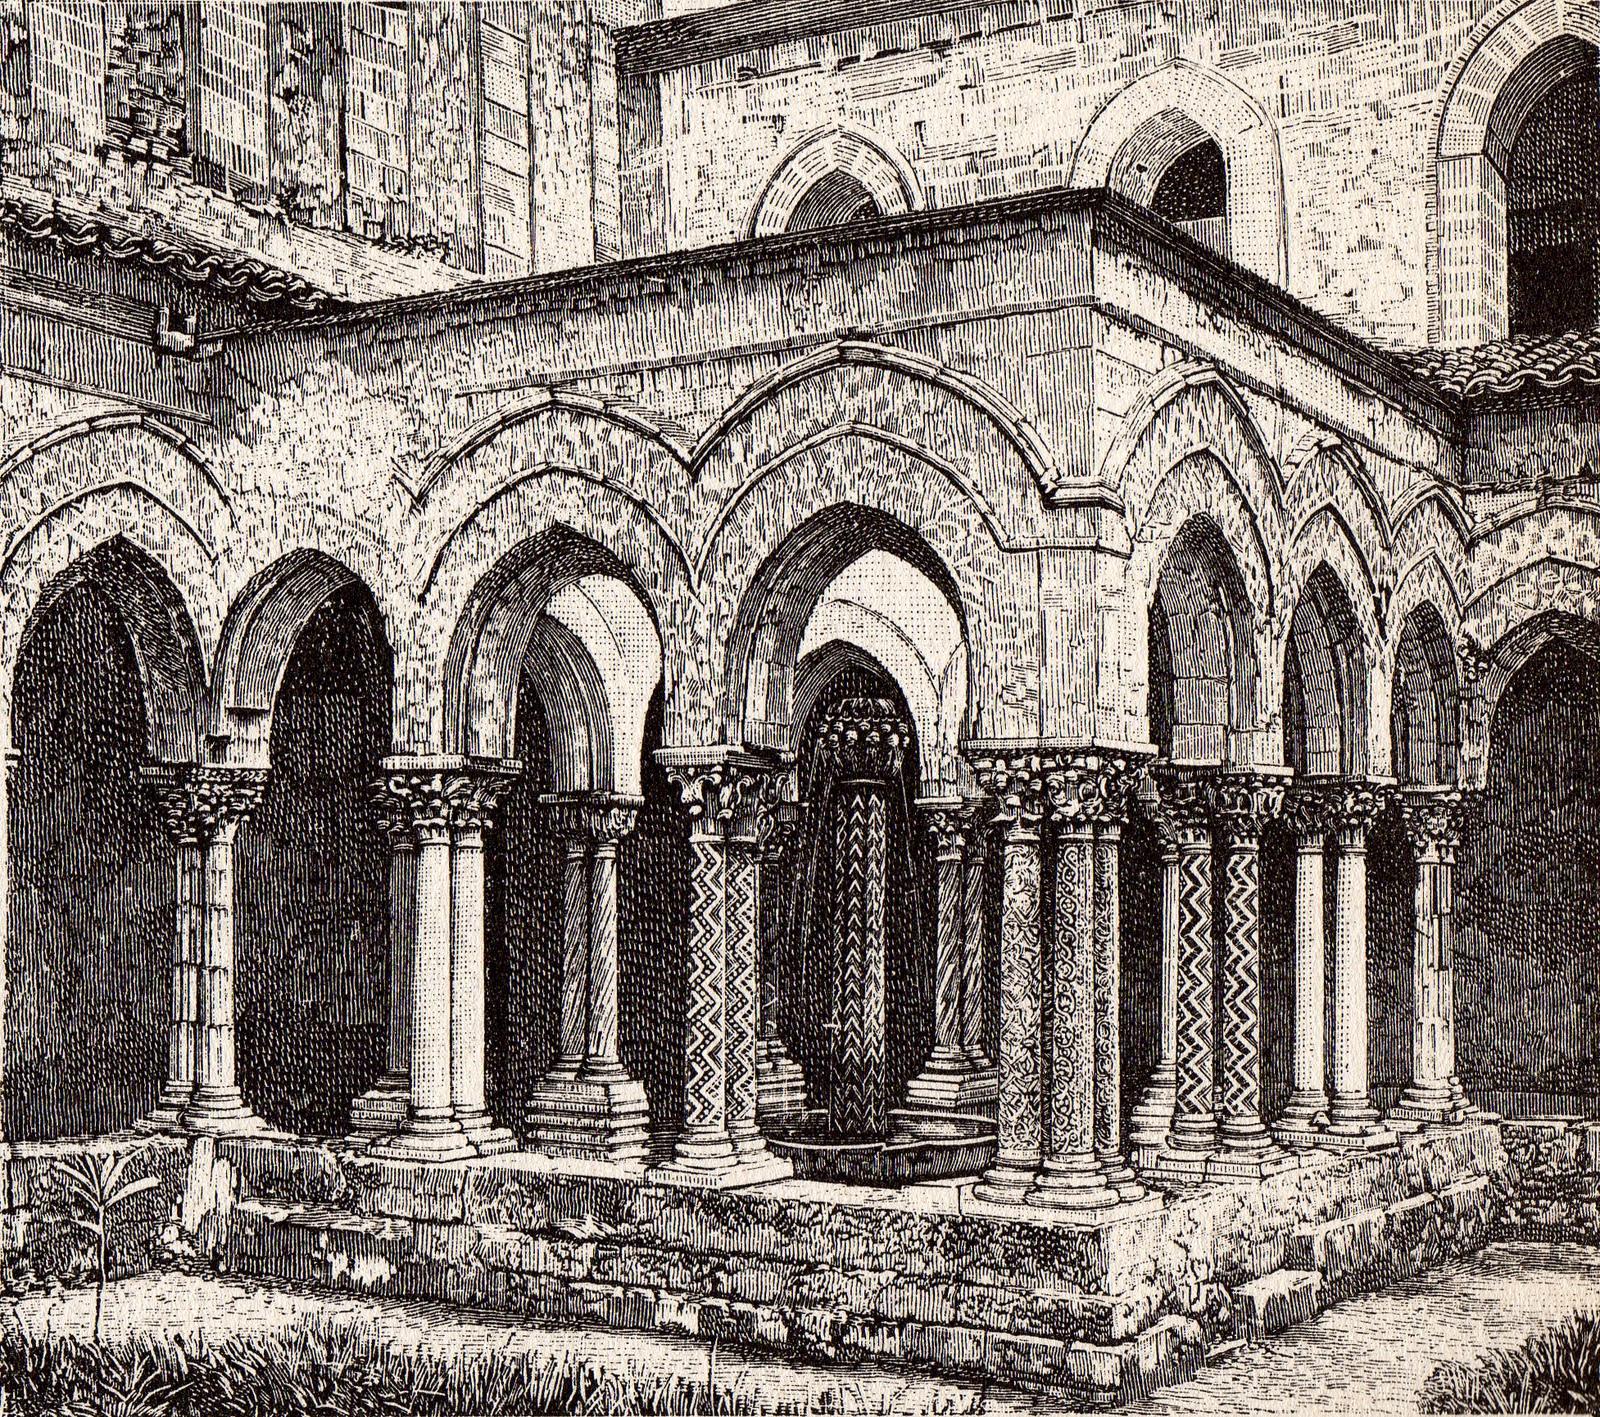 architettura arte architetture xilografie